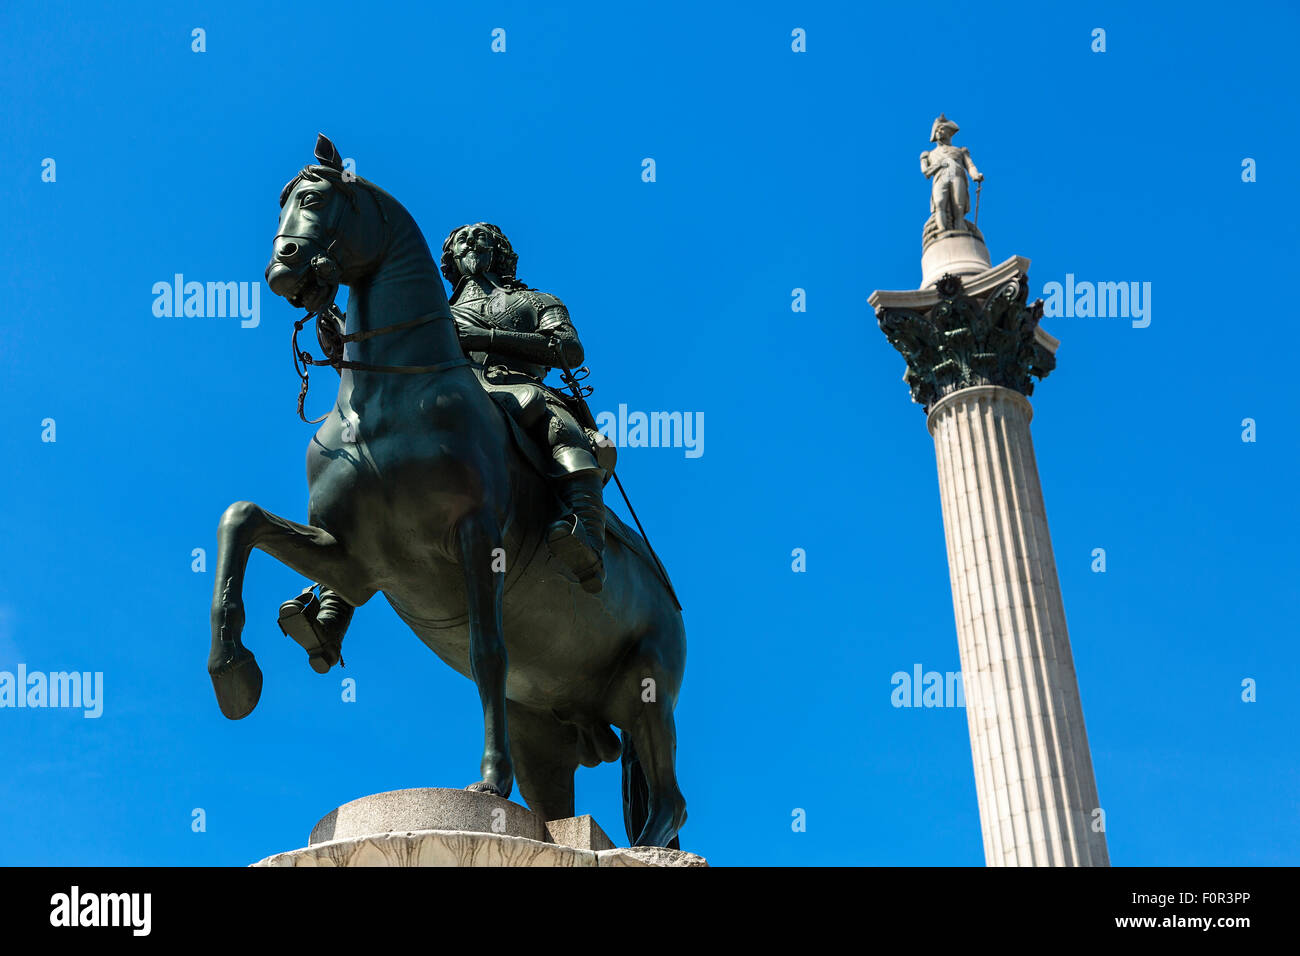 London, Trafalgar Square and Nelson's column - Stock Image